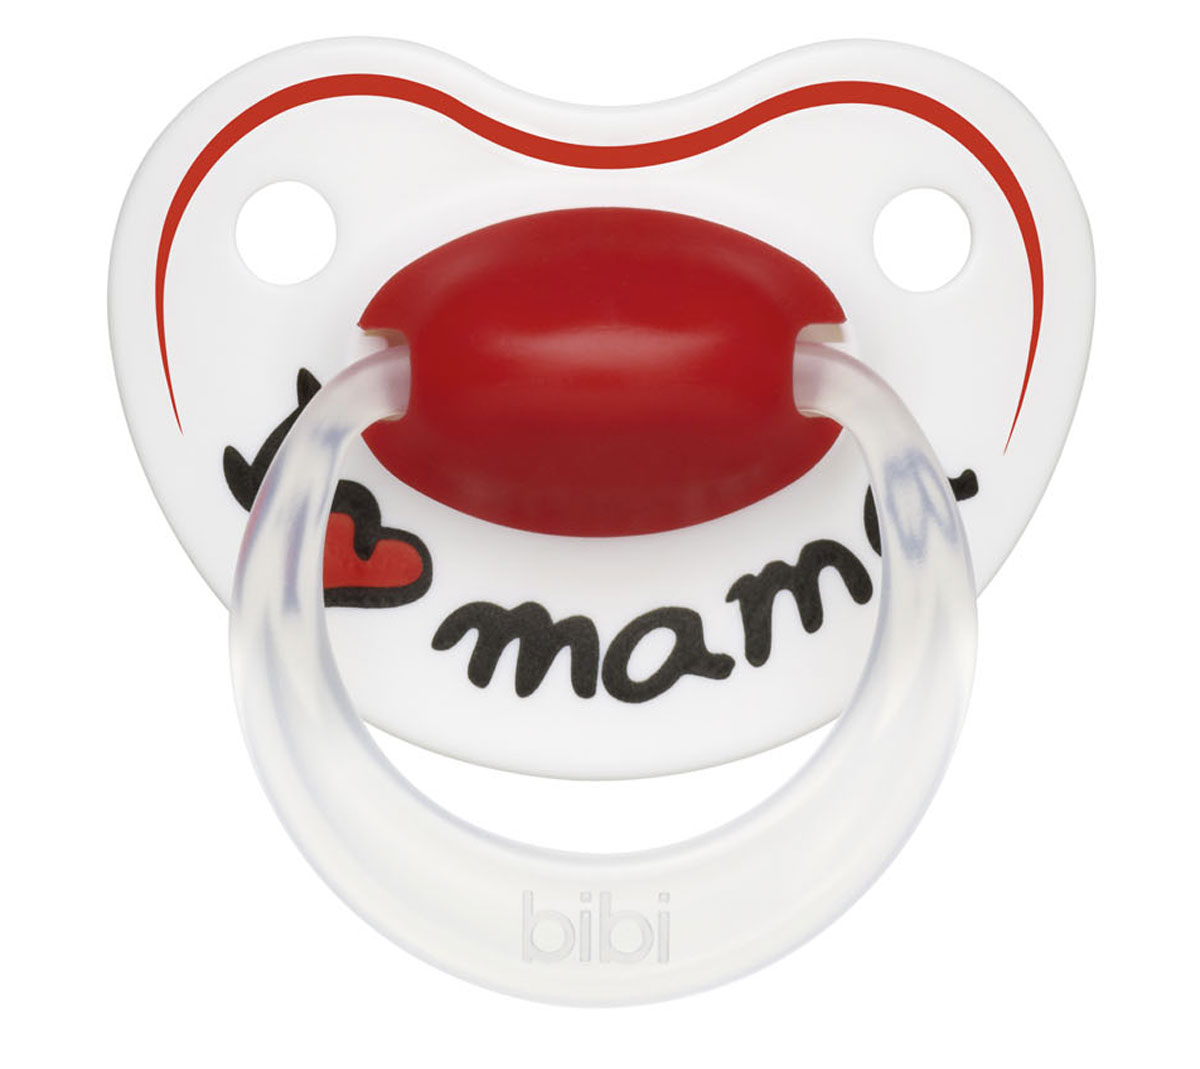 Bibi Пустышка силиконовая Premium Dental Happiness Mama от 0 до 6 месяцев happiness basics толстовка